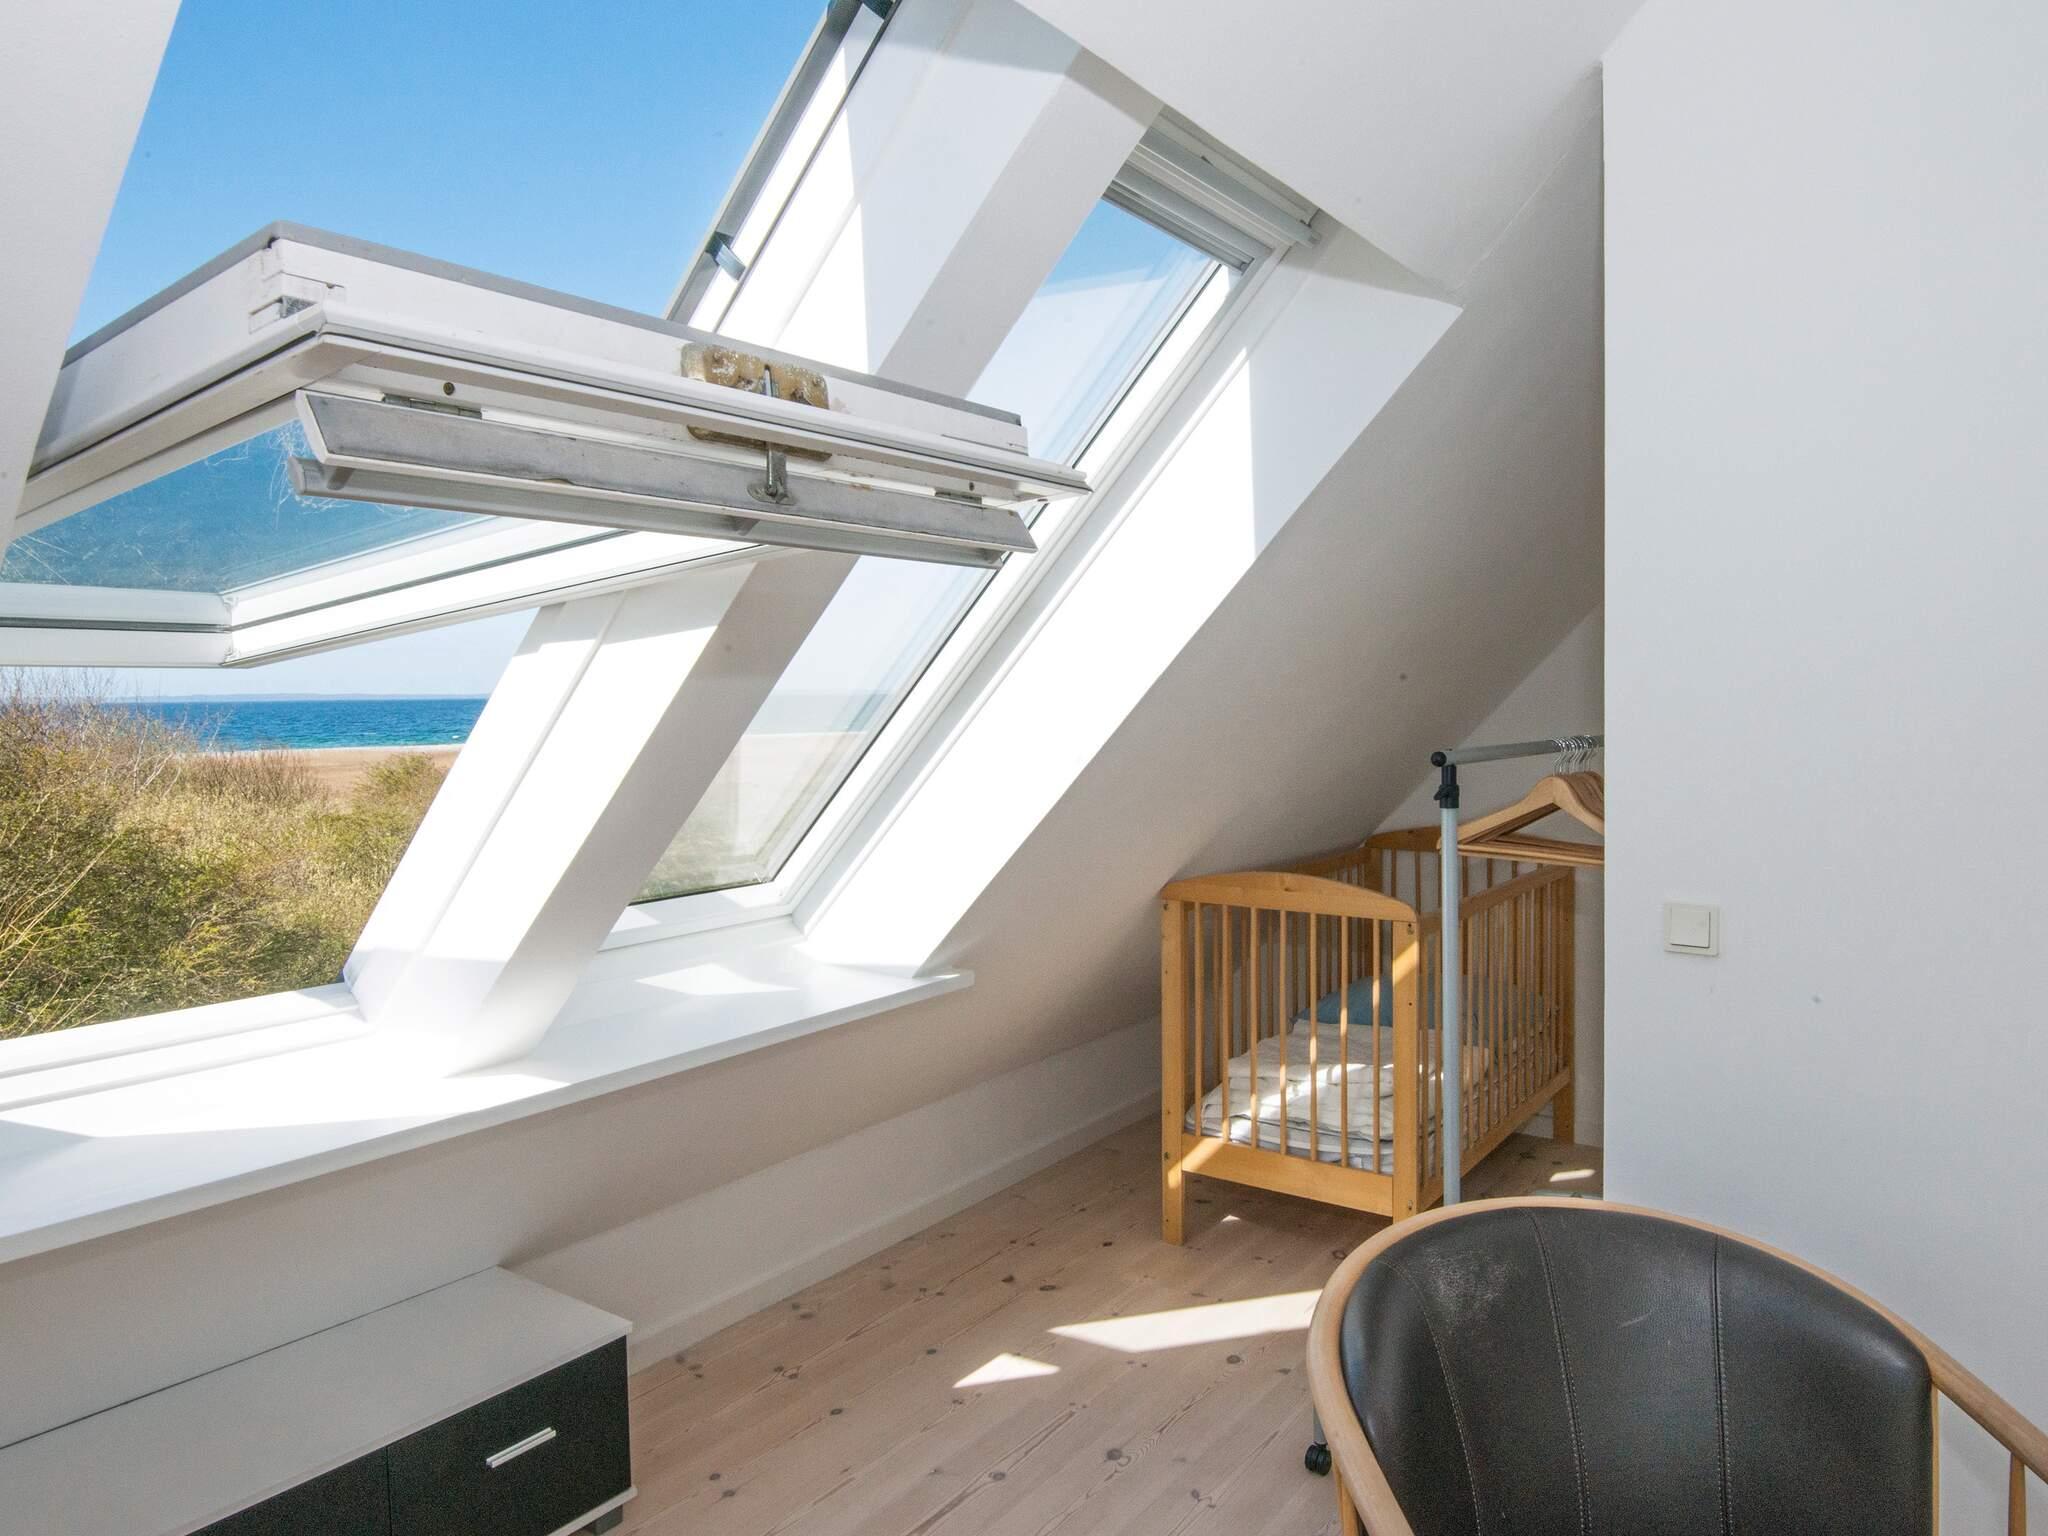 Maison de vacances Helgenæs (590964), Knebel, , Mer Baltique danoise, Danemark, image 12